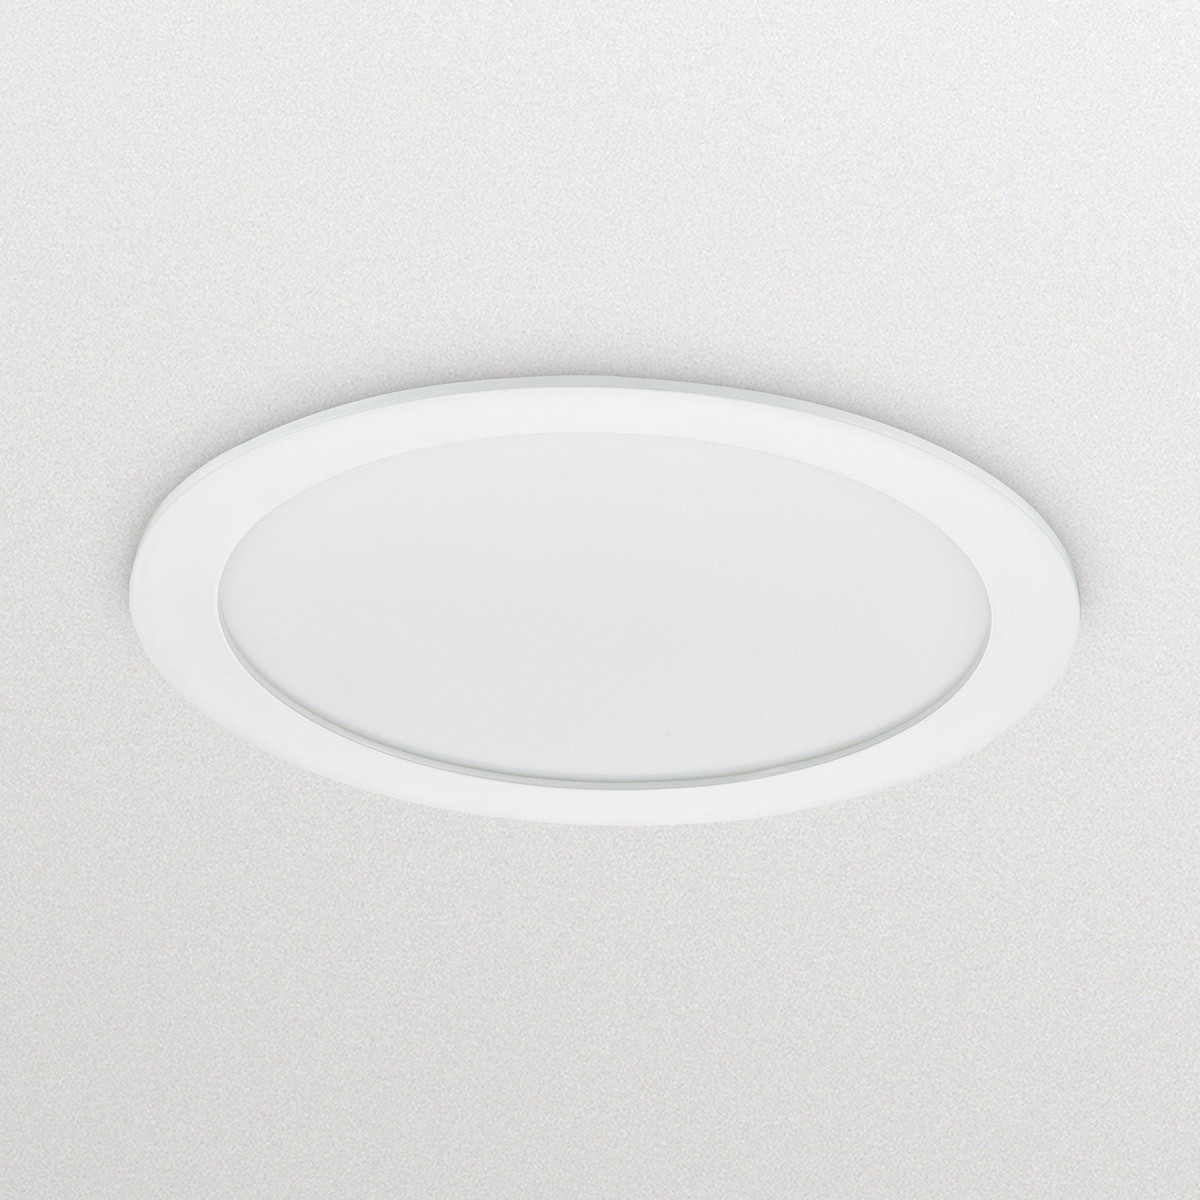 Philips CoreLine SlimDownlight DN145B LED 2100lm/830 DALI Hvid